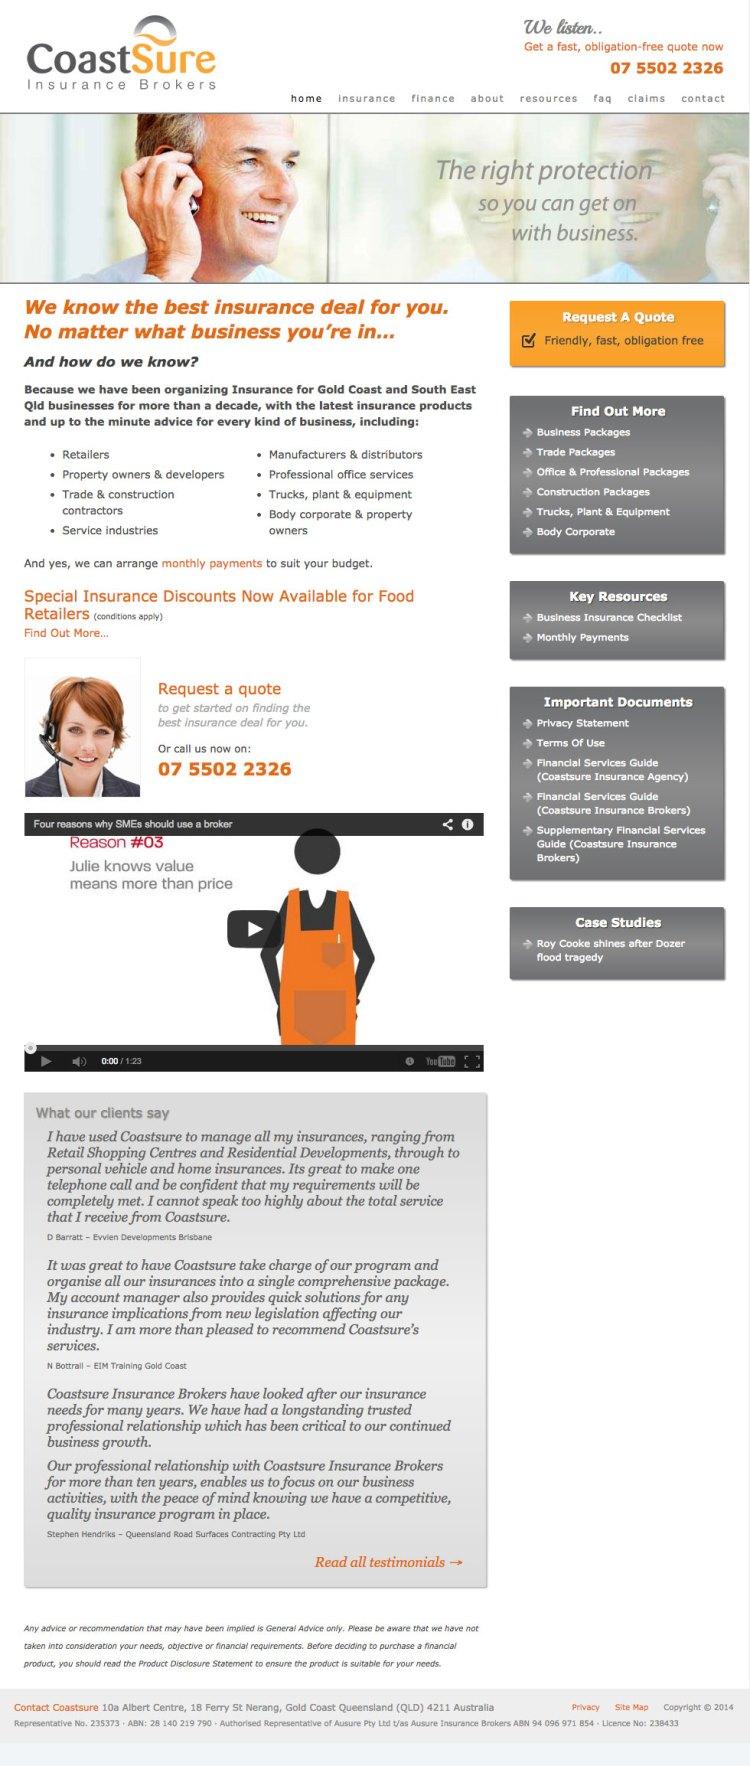 CoastSure-Insurance-Brokers-gold-coast-wordpress